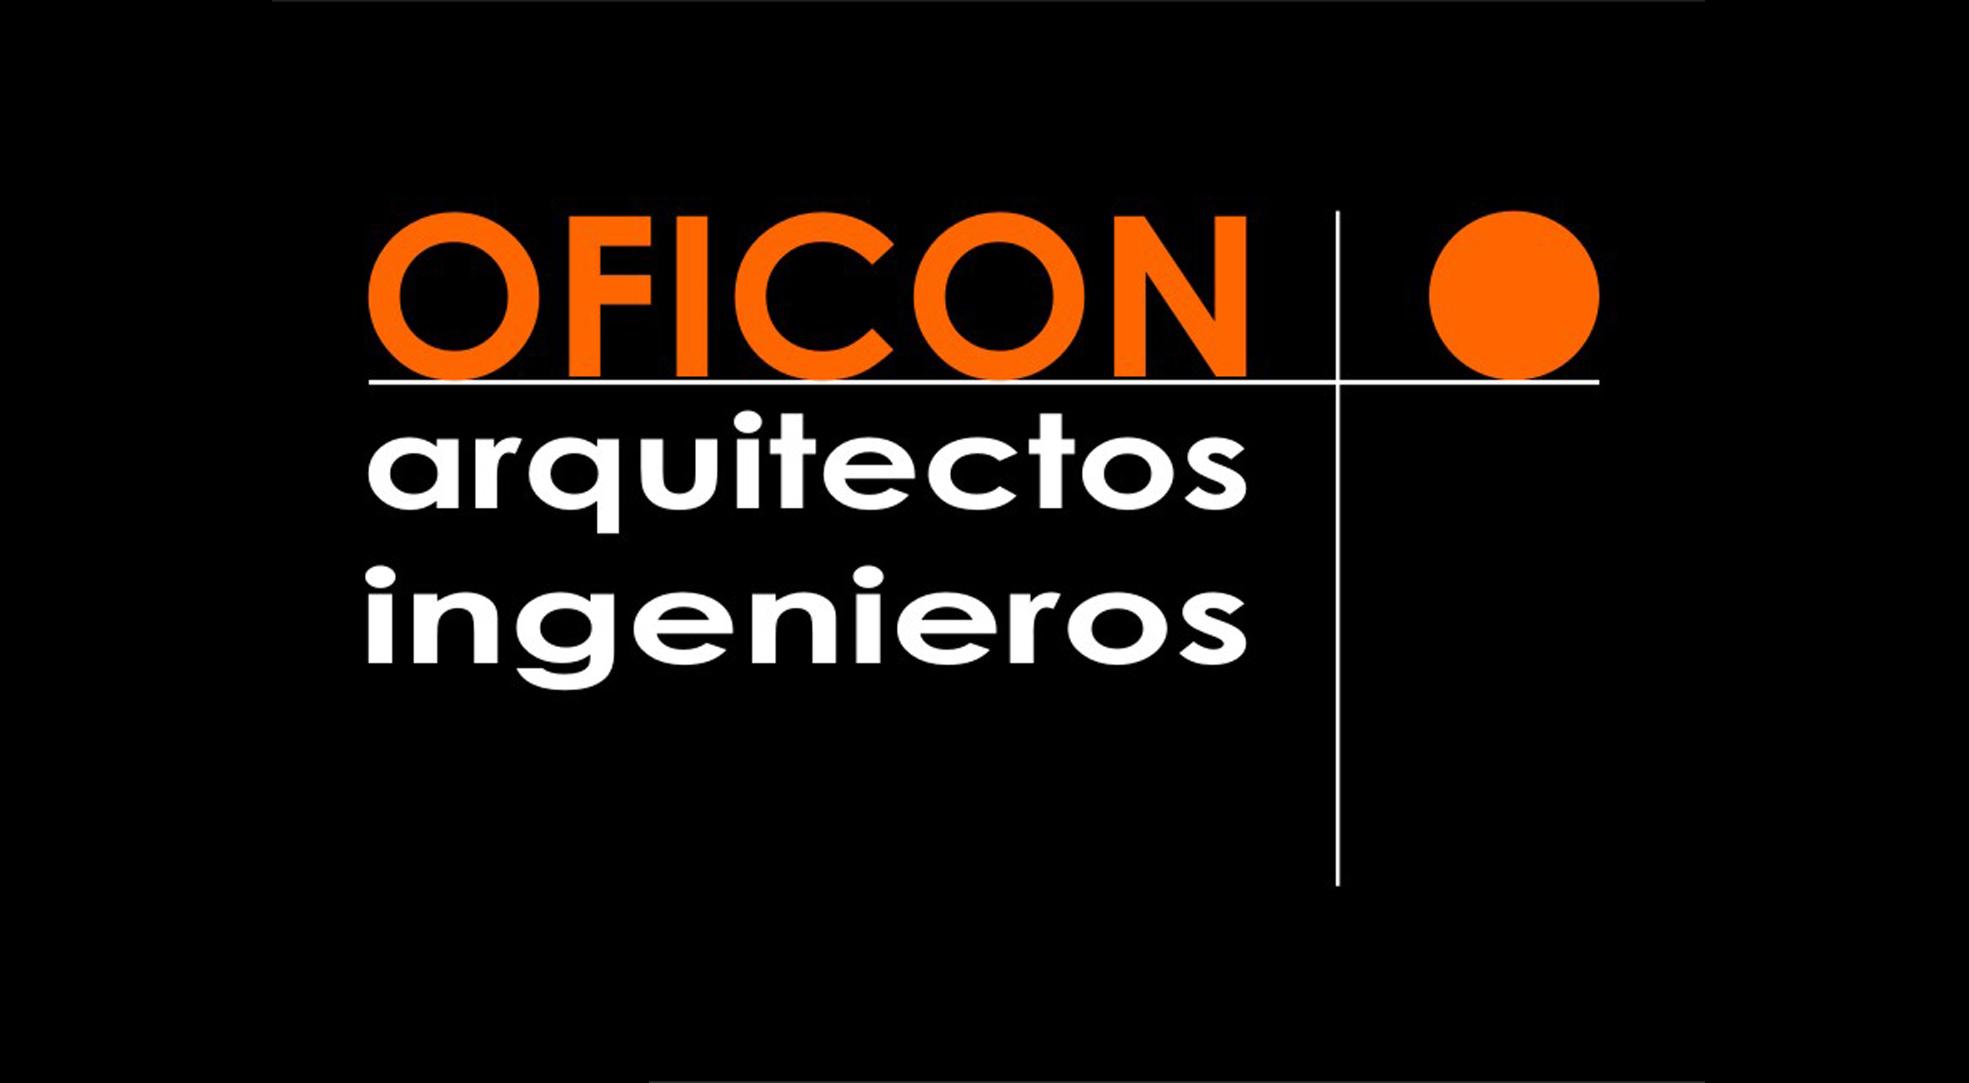 Oficon Arquitectos E Ingenieros